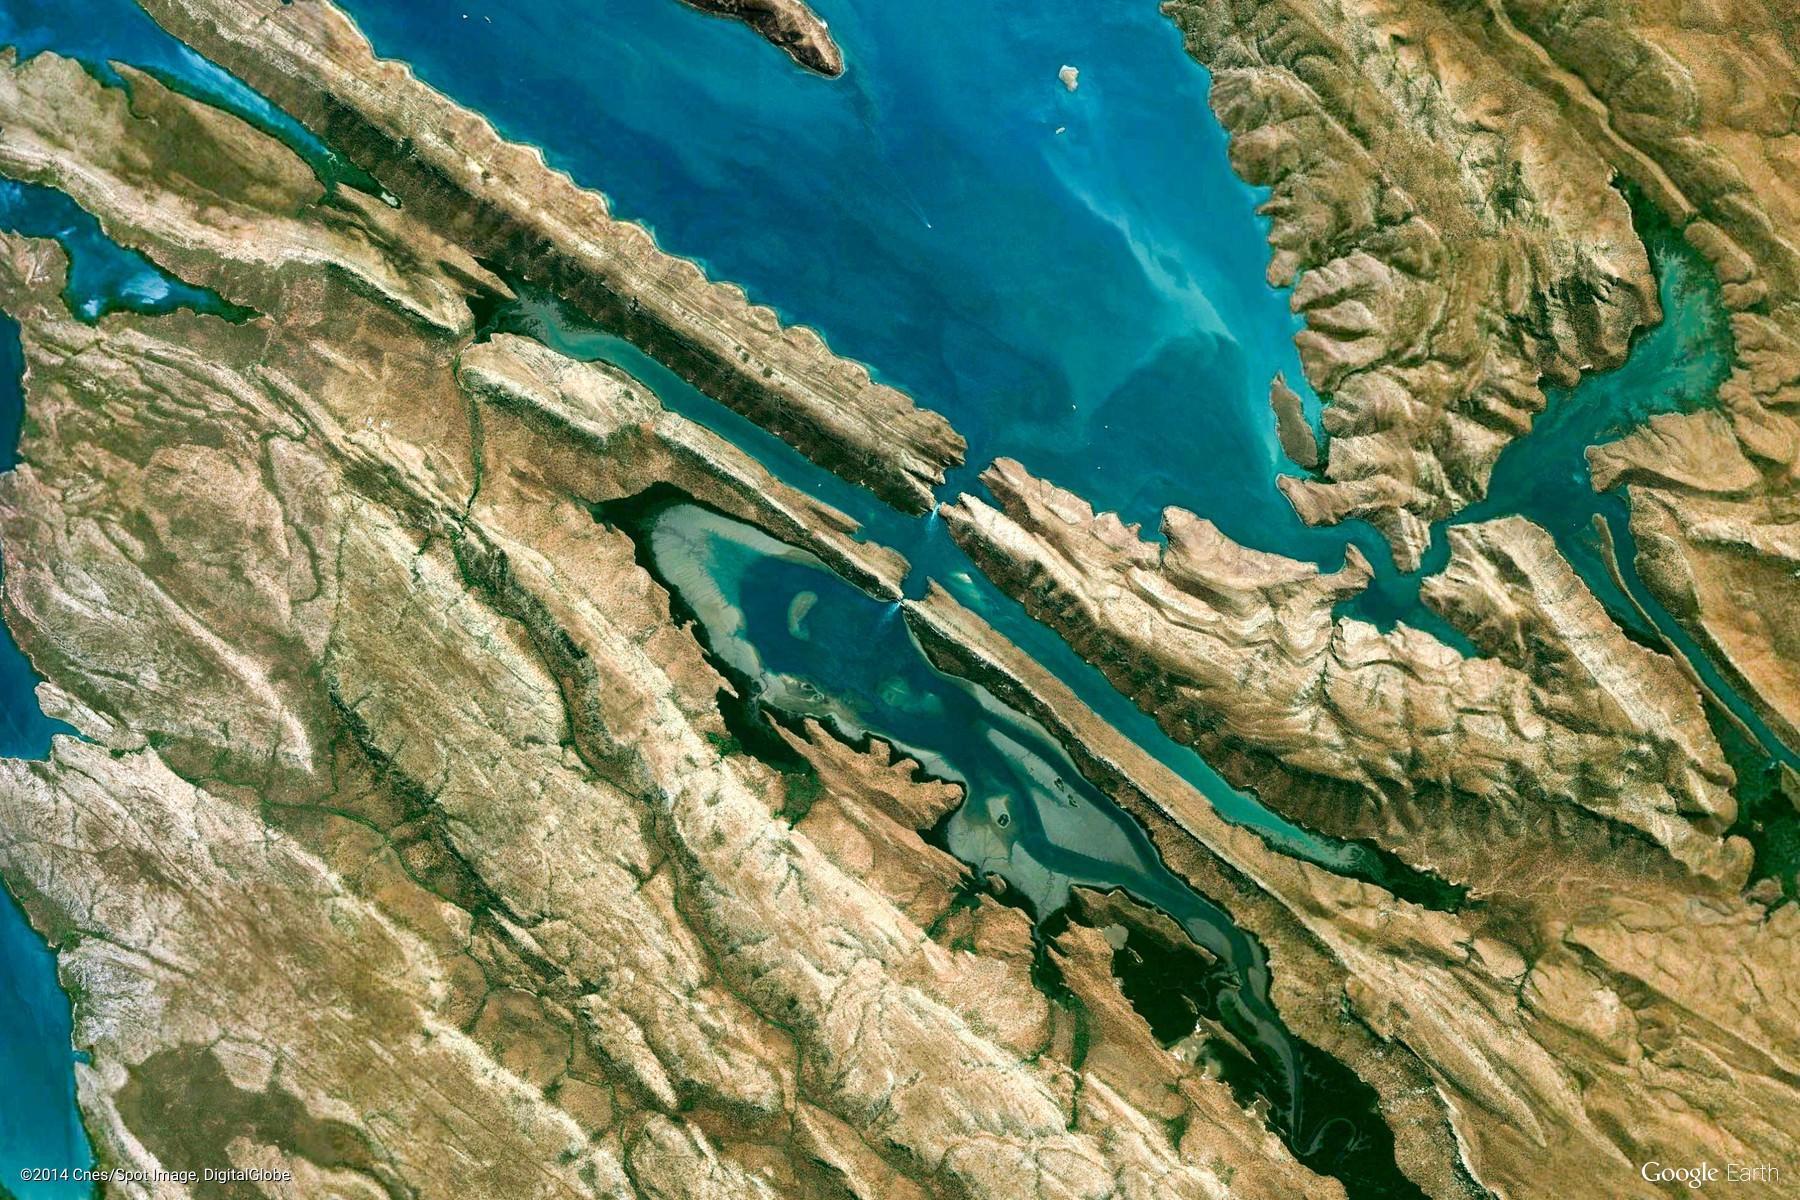 3Ygoogle-earth-view-1948.jpg